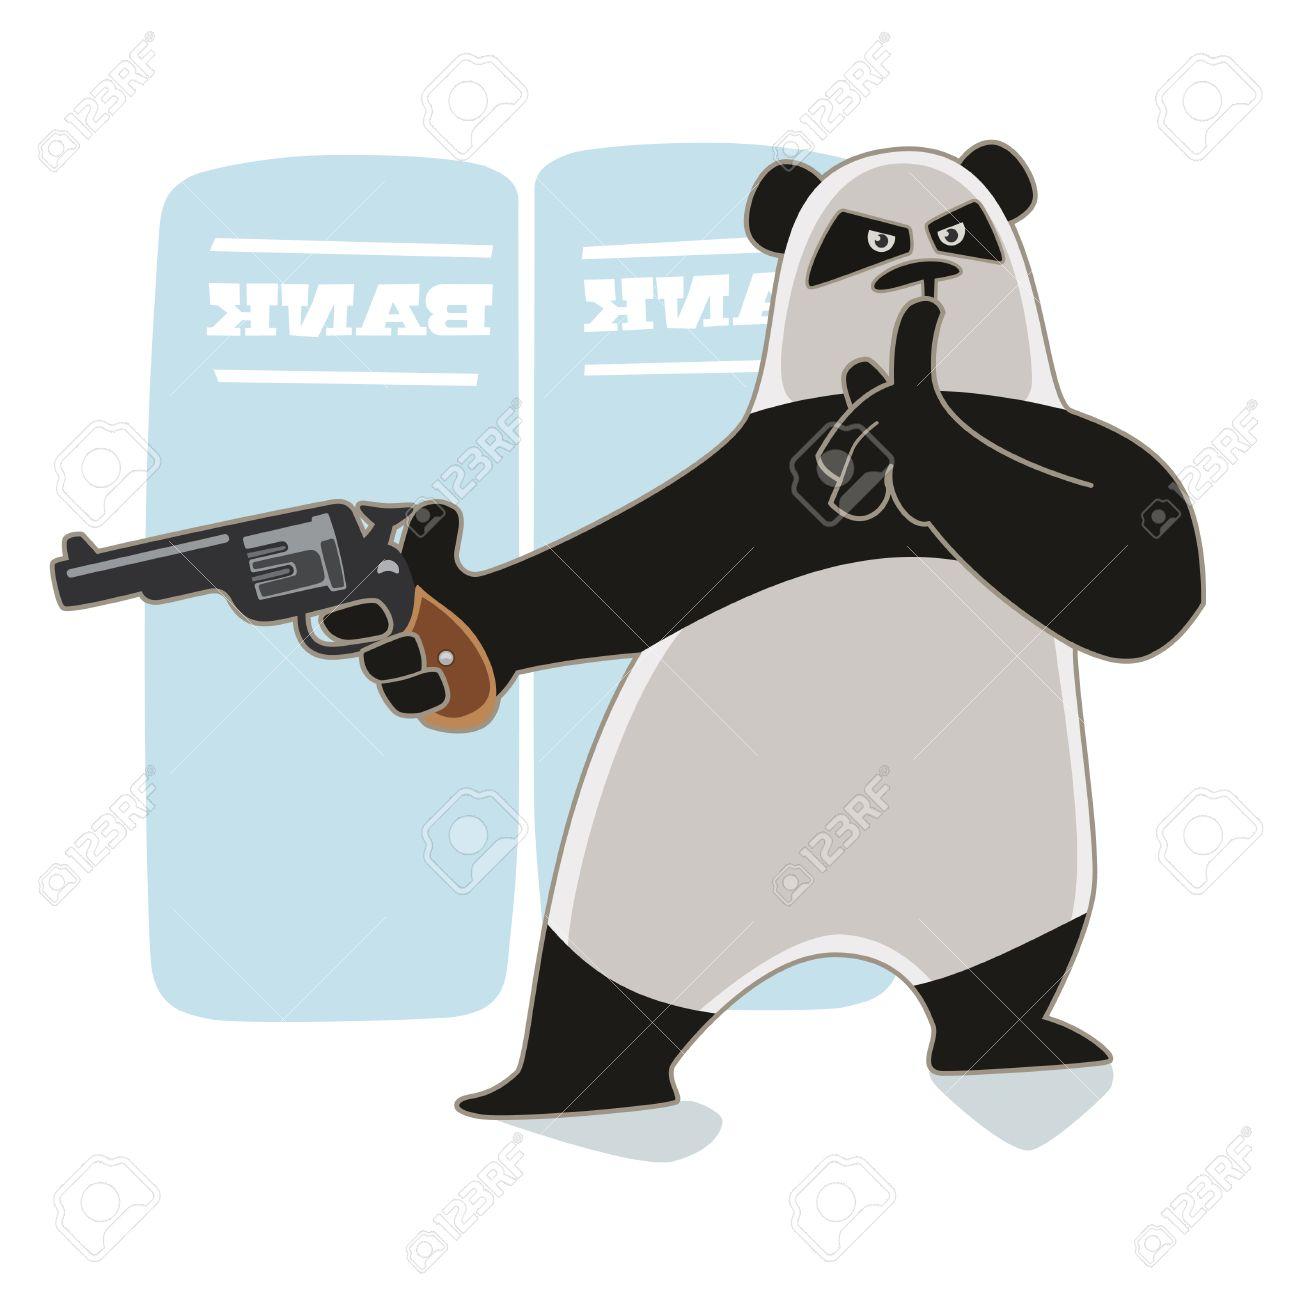 Robber Holding Gun Robber Panda Holding a Gun